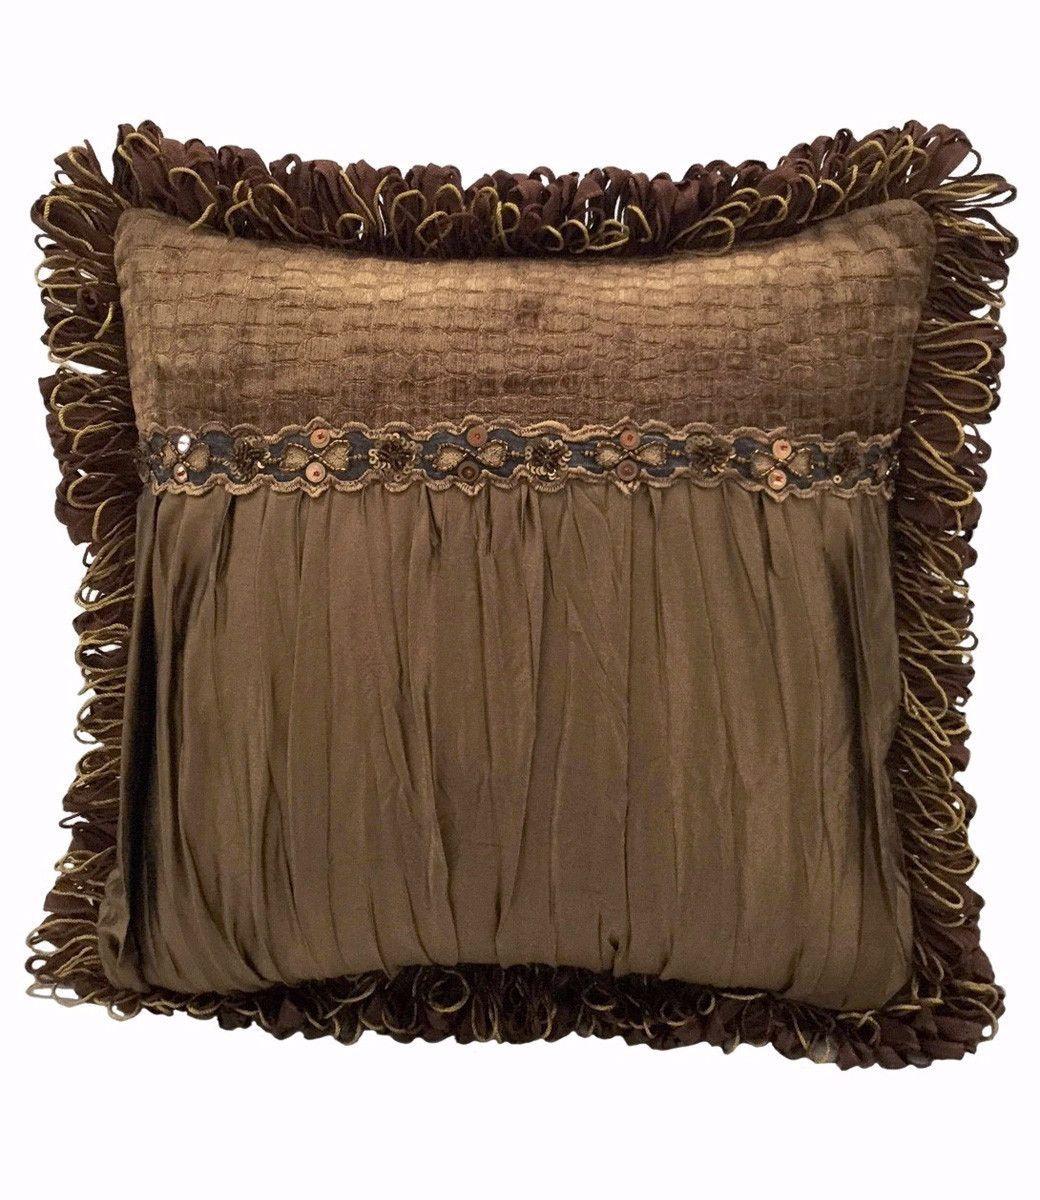 Luxury Bedding Zanzibar Accent Pillows Caramel Silk And